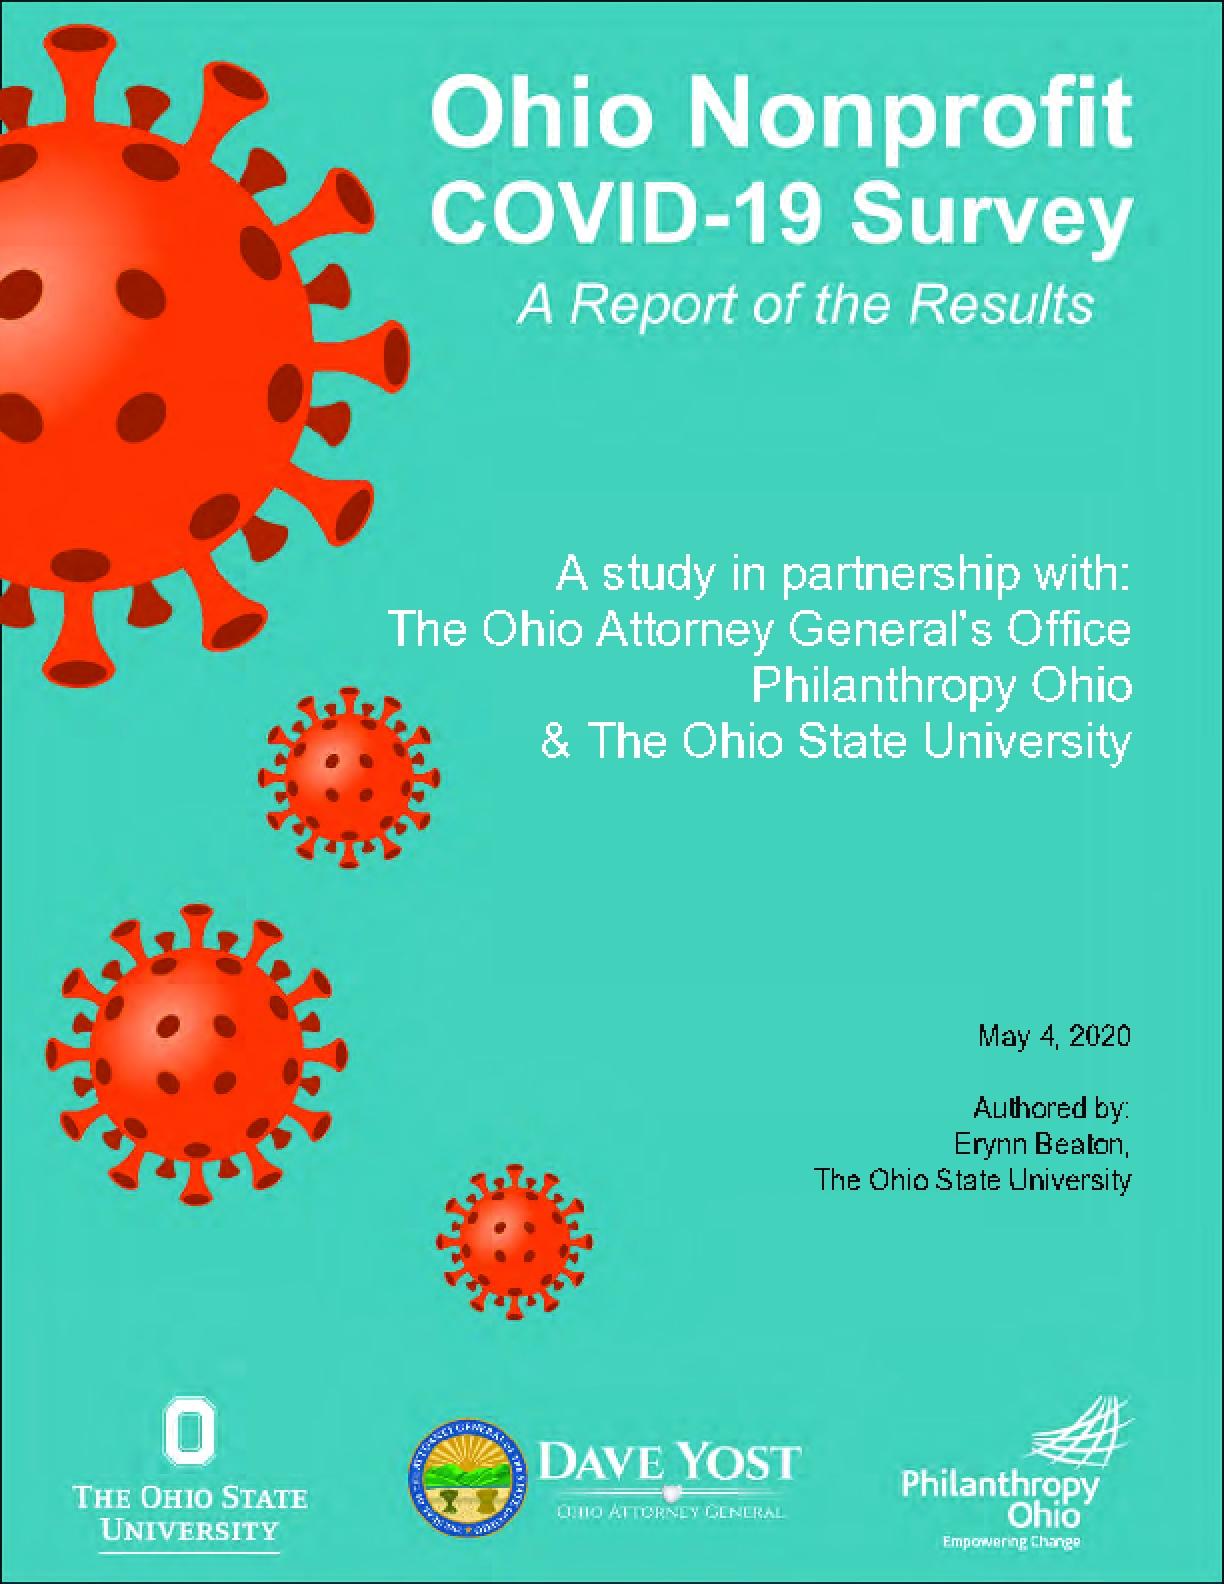 Ohio Nonprofit COVID-19 Survey: A Report of the Results